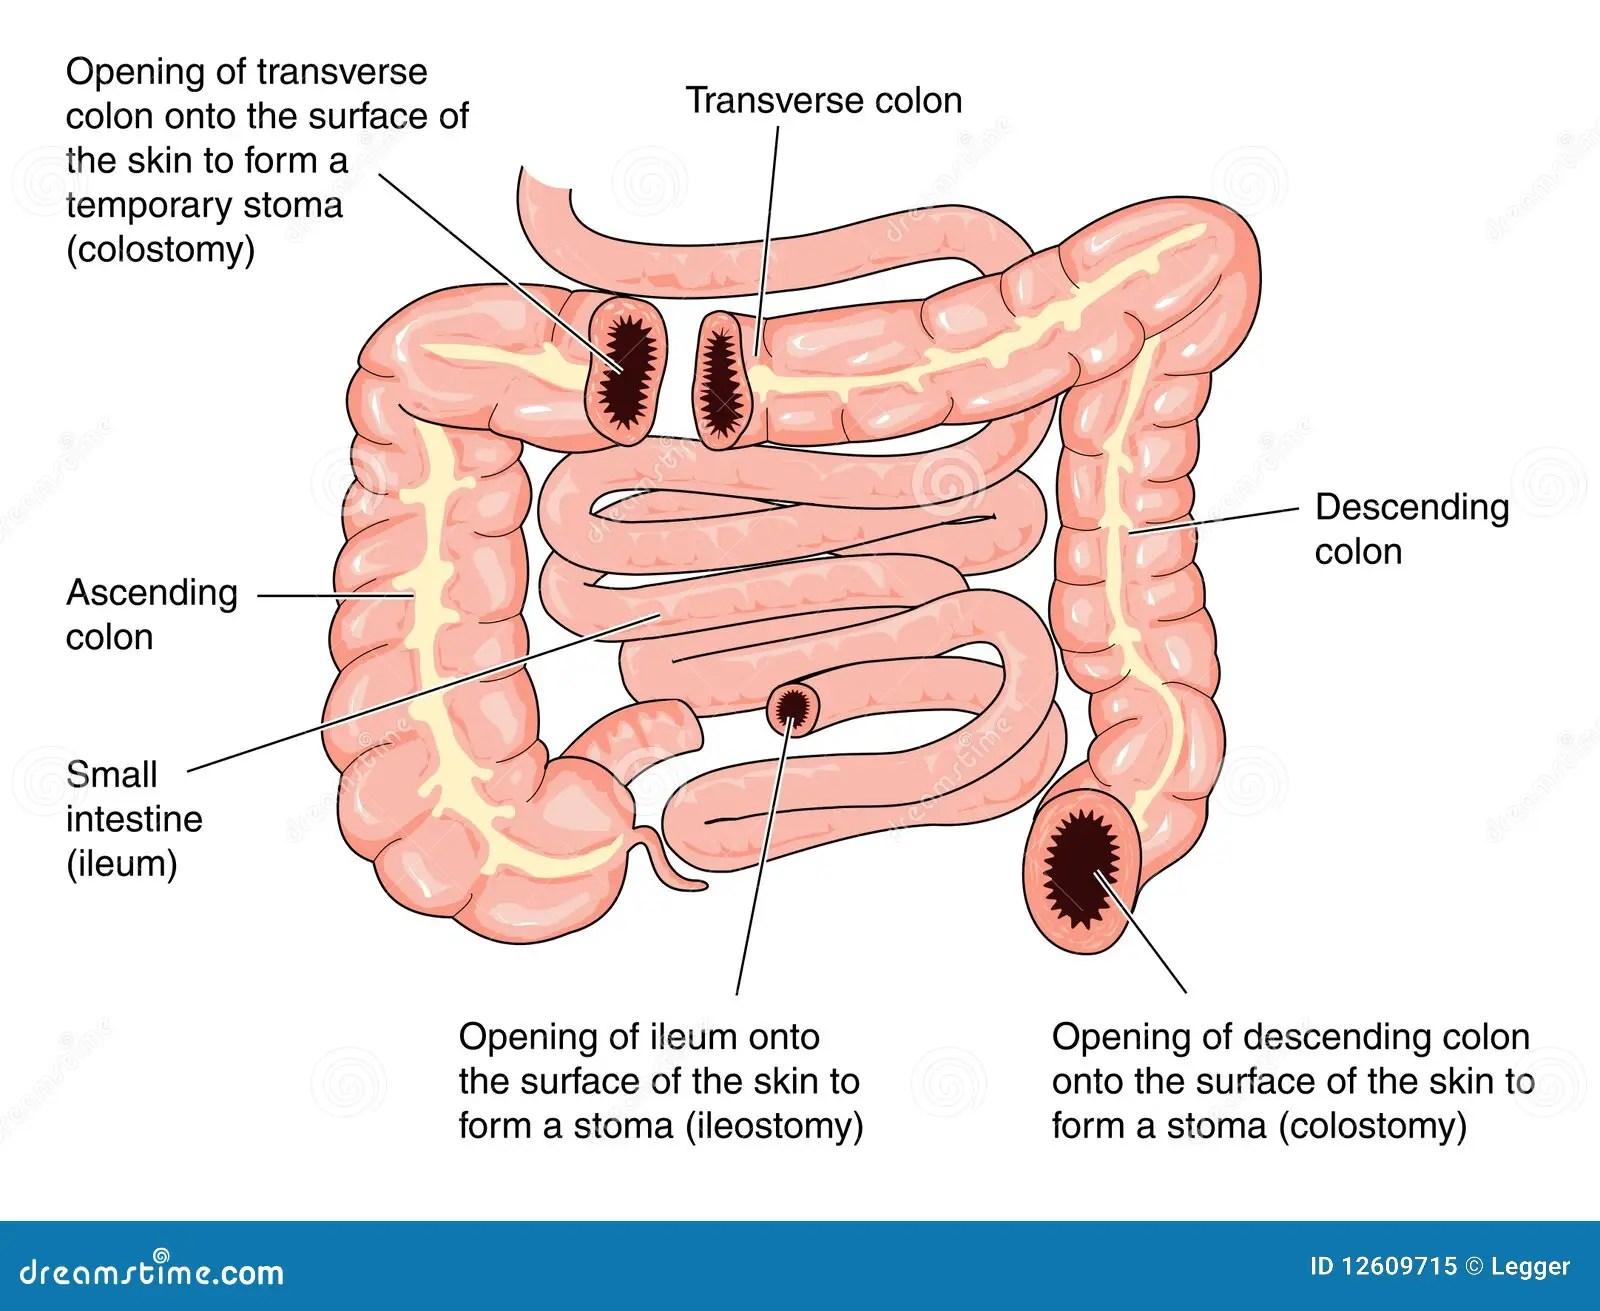 large intestine diagram blank spdt switch wiring colostomy sites stock vector illustration of ileostomy